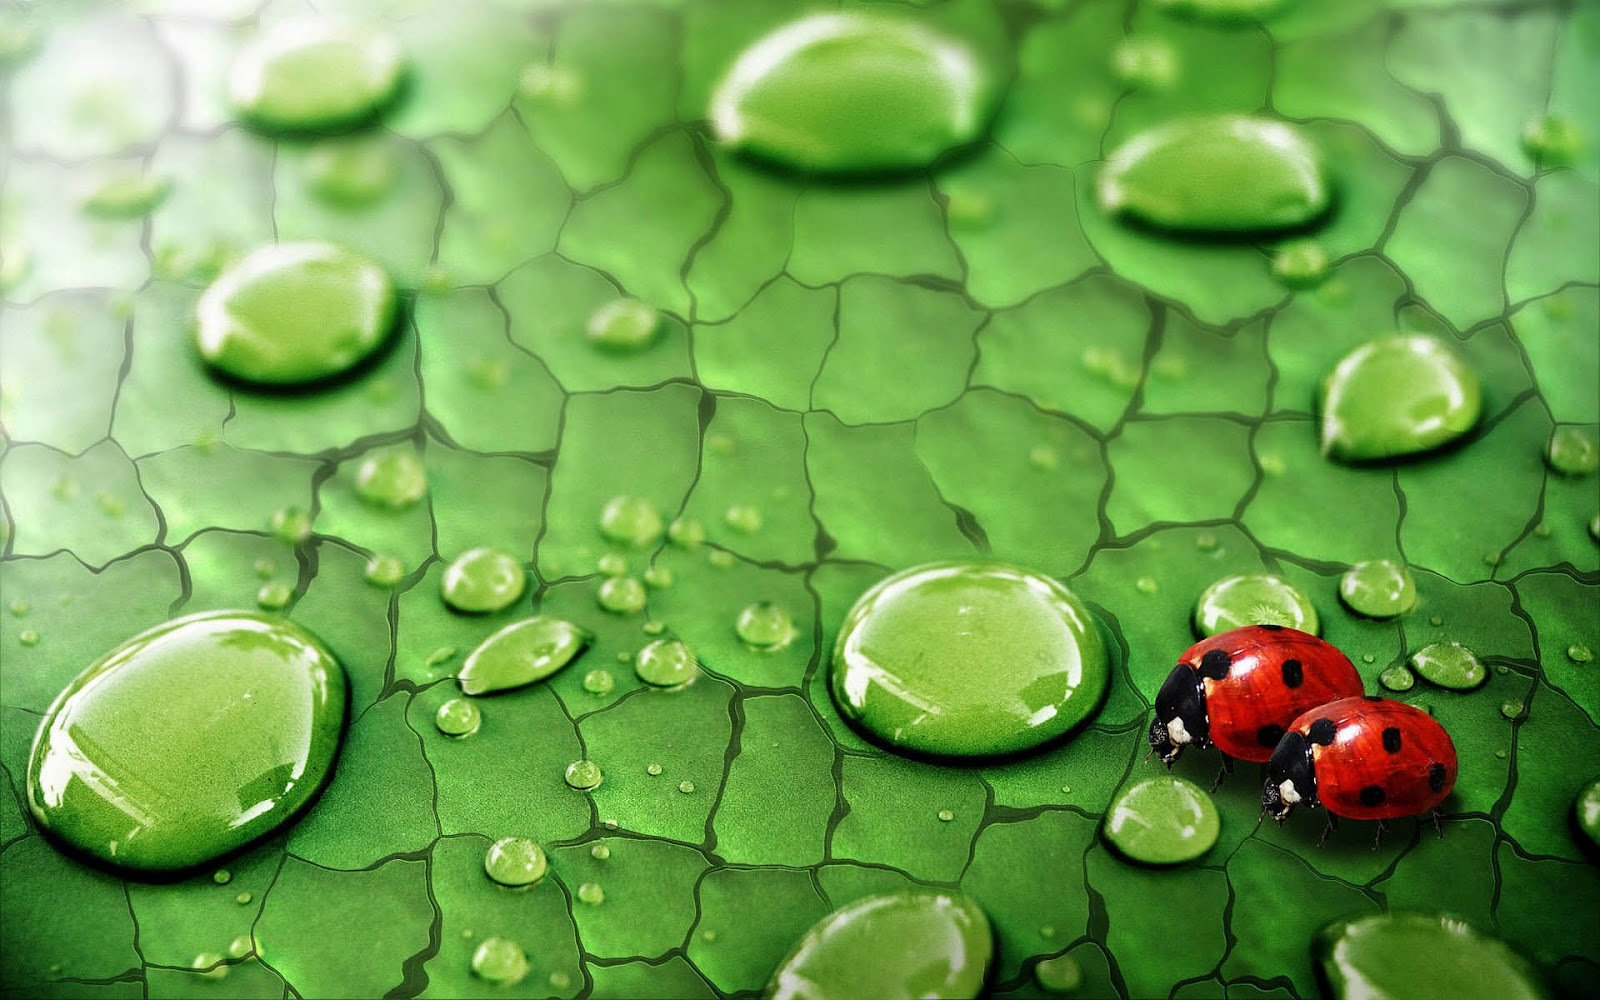 1bpblogspot CZCmVxKo548 UDkSNgaUIYI Wallpaper With Two Ladybugs Walking On A Leaf Water Drops